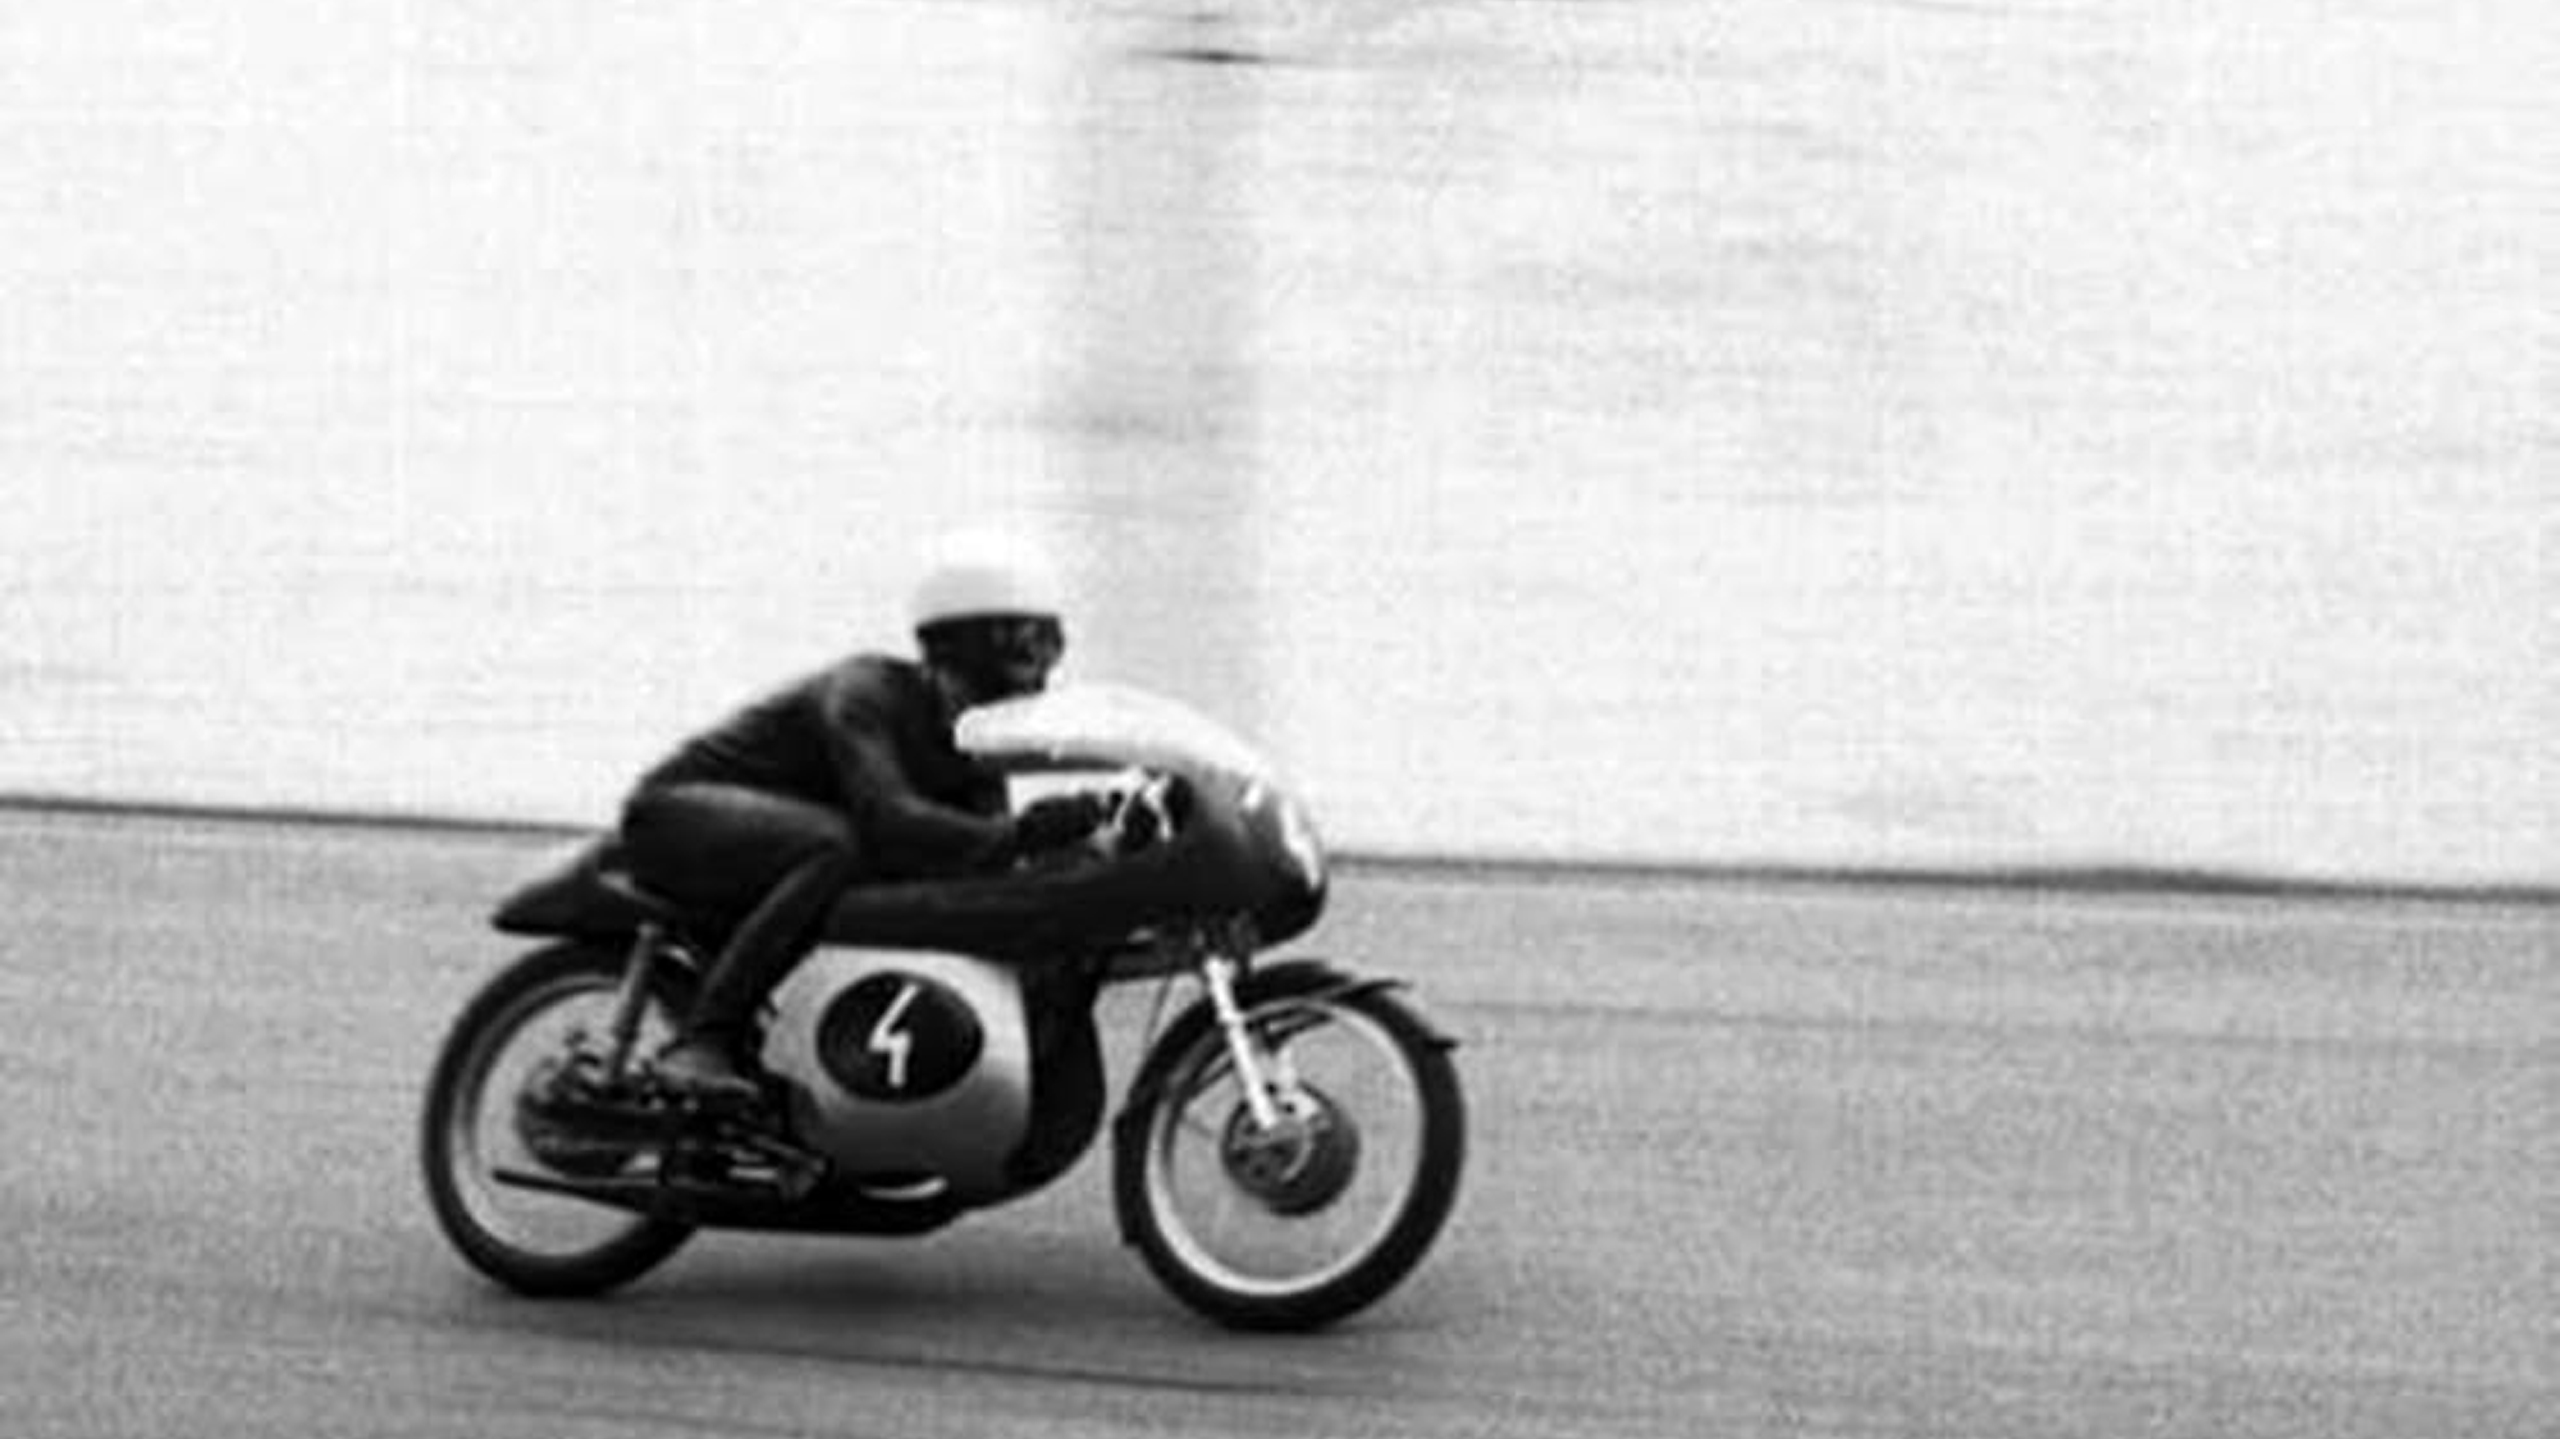 Motorcycle desktop wallpaper   Page 2 2560x1439